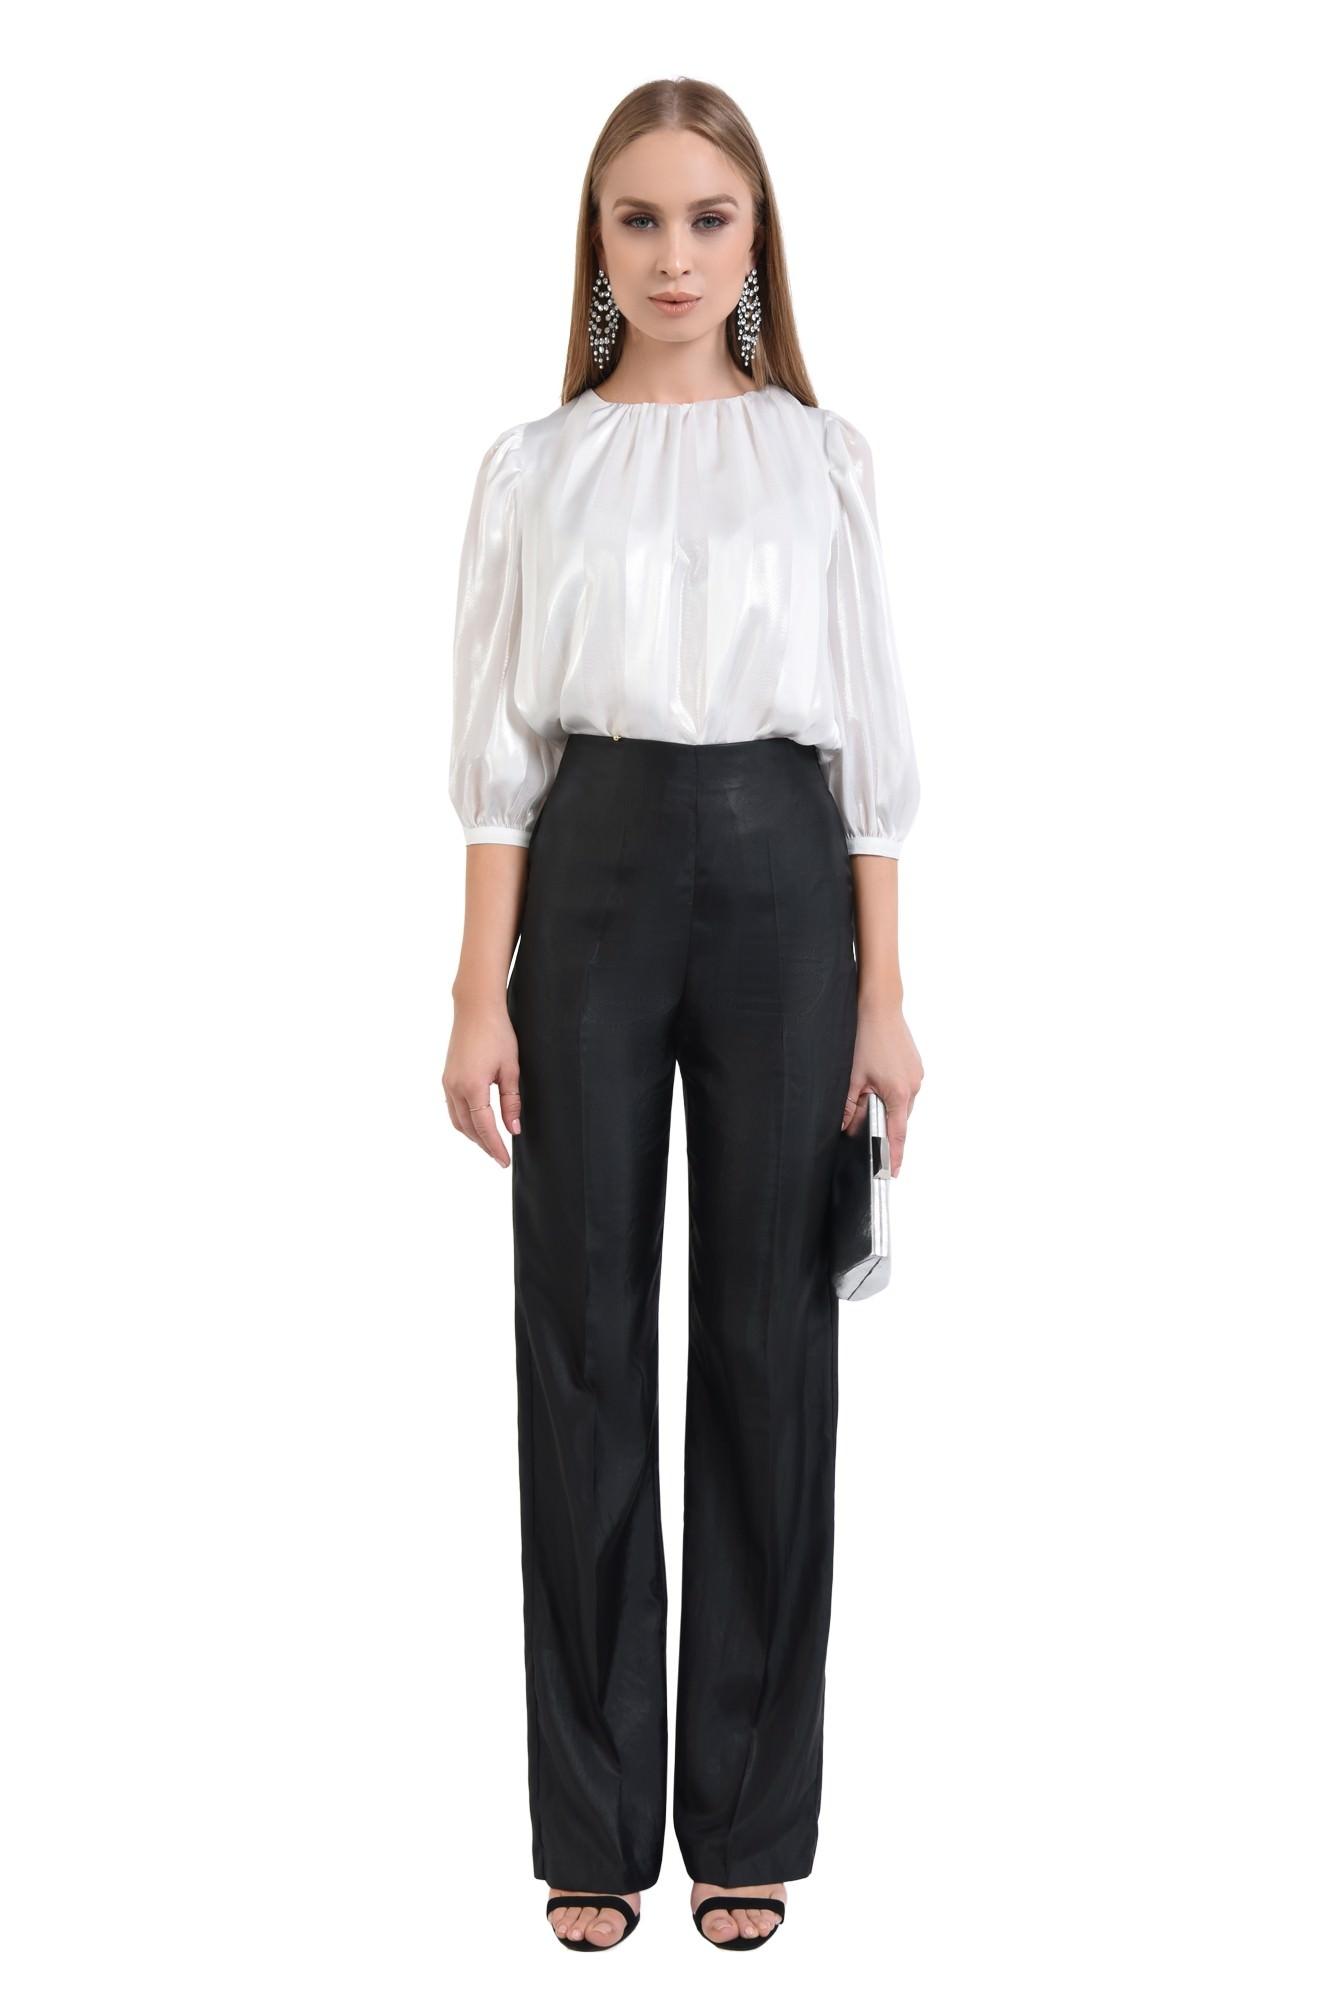 3 - 360 - bluza eleganta argintie, sifon, dungi, pliseuri la decolteu